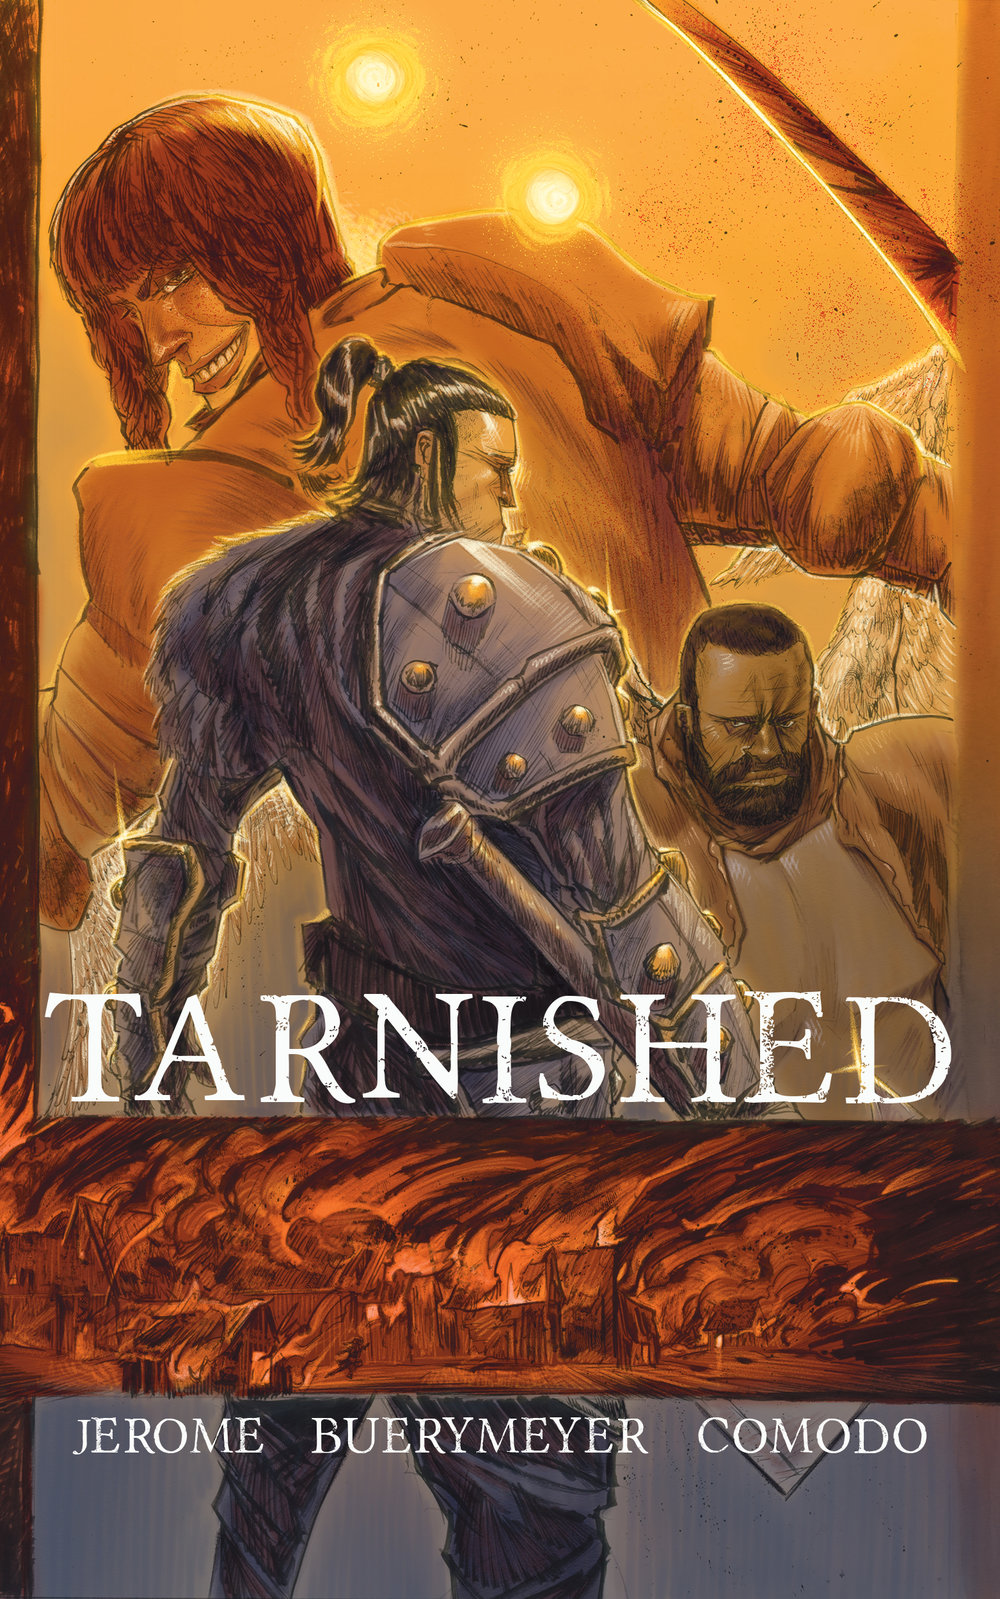 TARNISHED by Kristopher Jerome, Patrick Buerymeyer and Davi Comodo